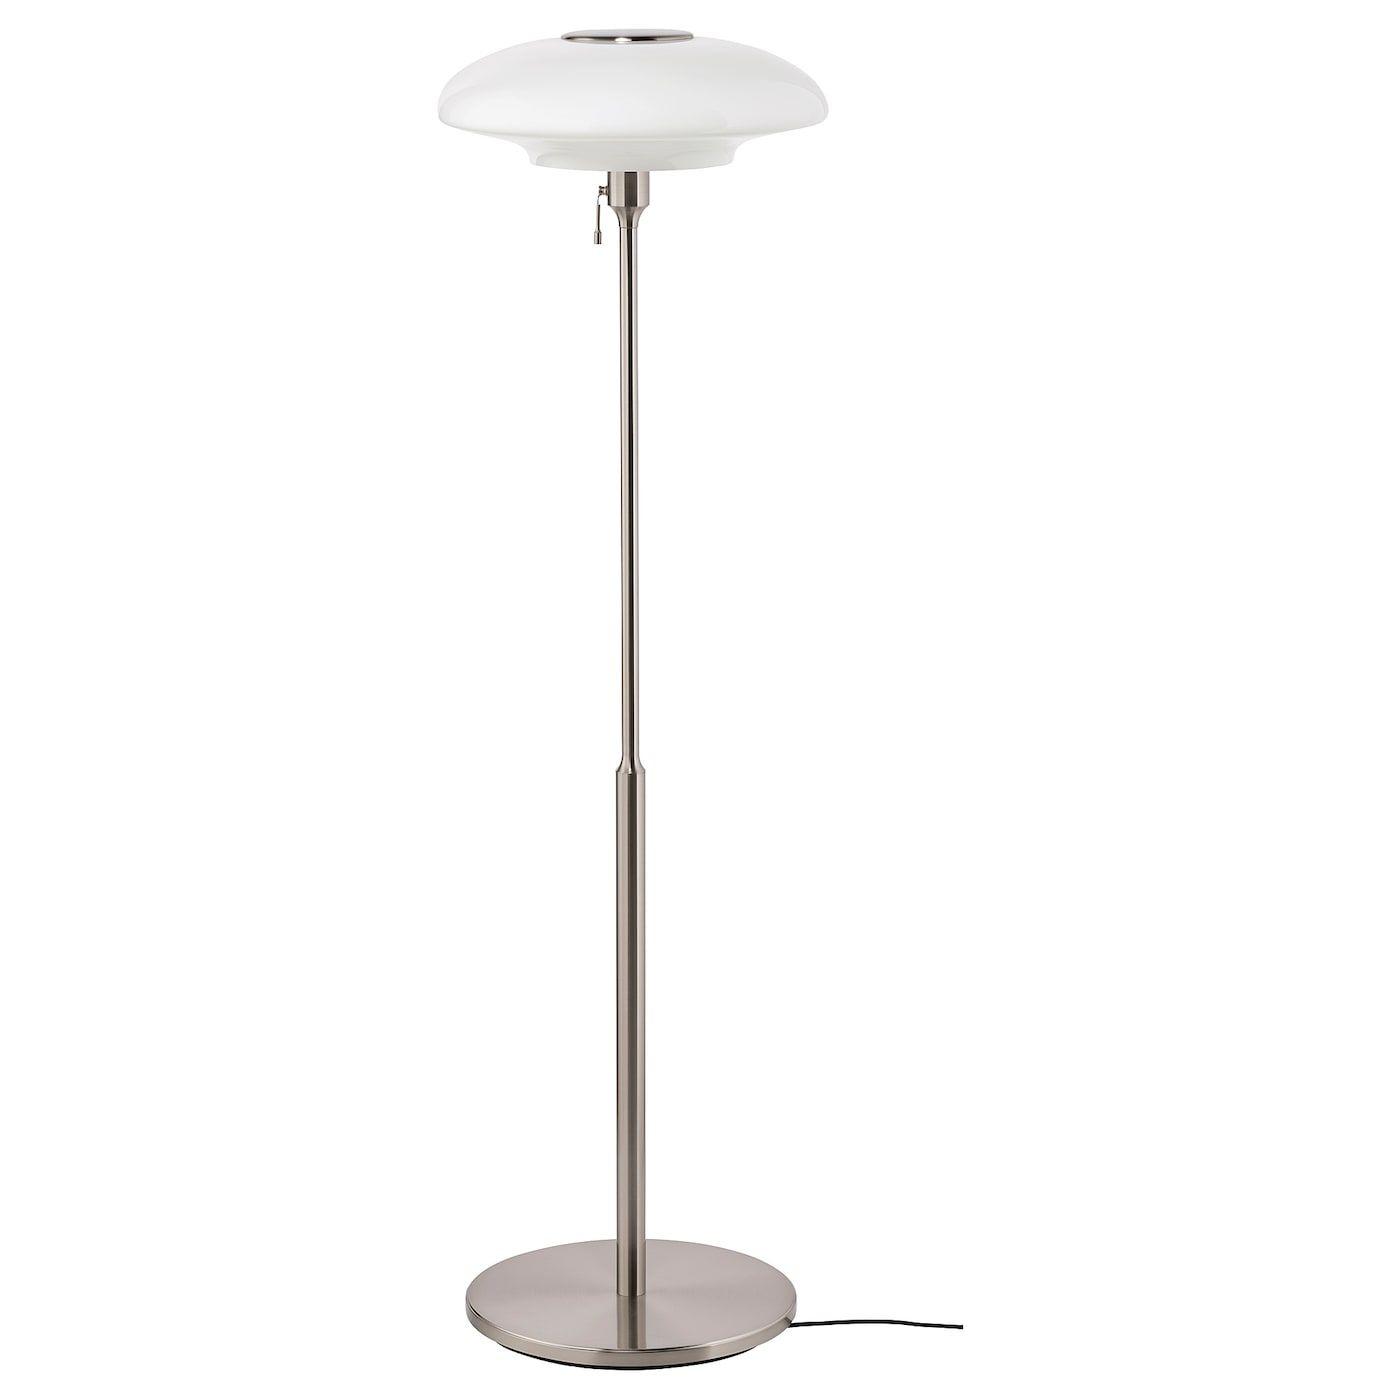 Tallbyn Staande Lamp Vernikkeld Opaalwit Glas 135 Cm Ikea Floor Lamp Ikea Floor Lamp Glass Floor Lamp